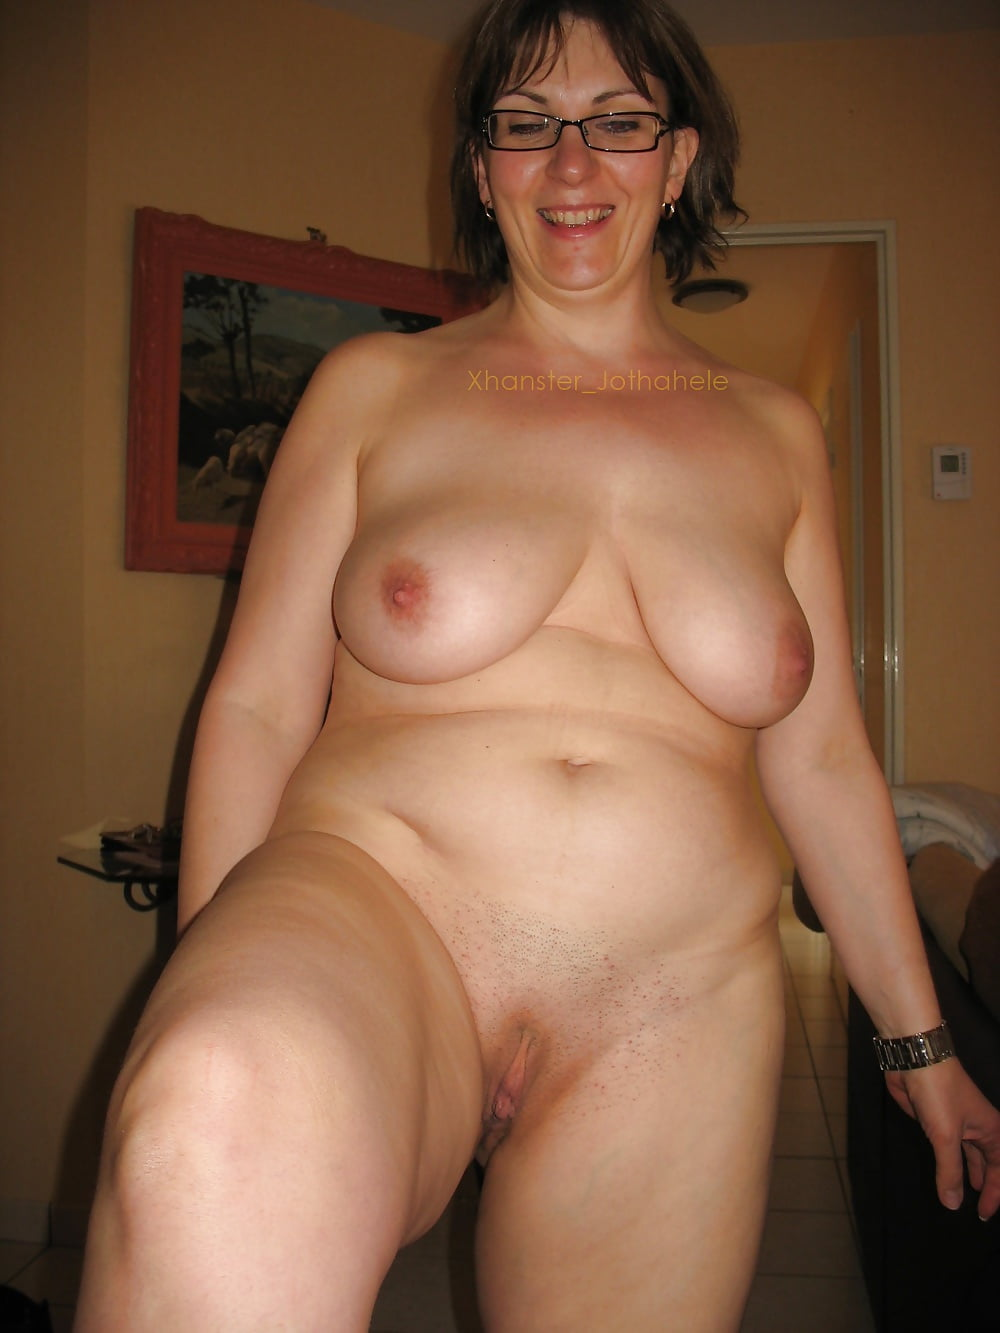 shaved granny pics Mature